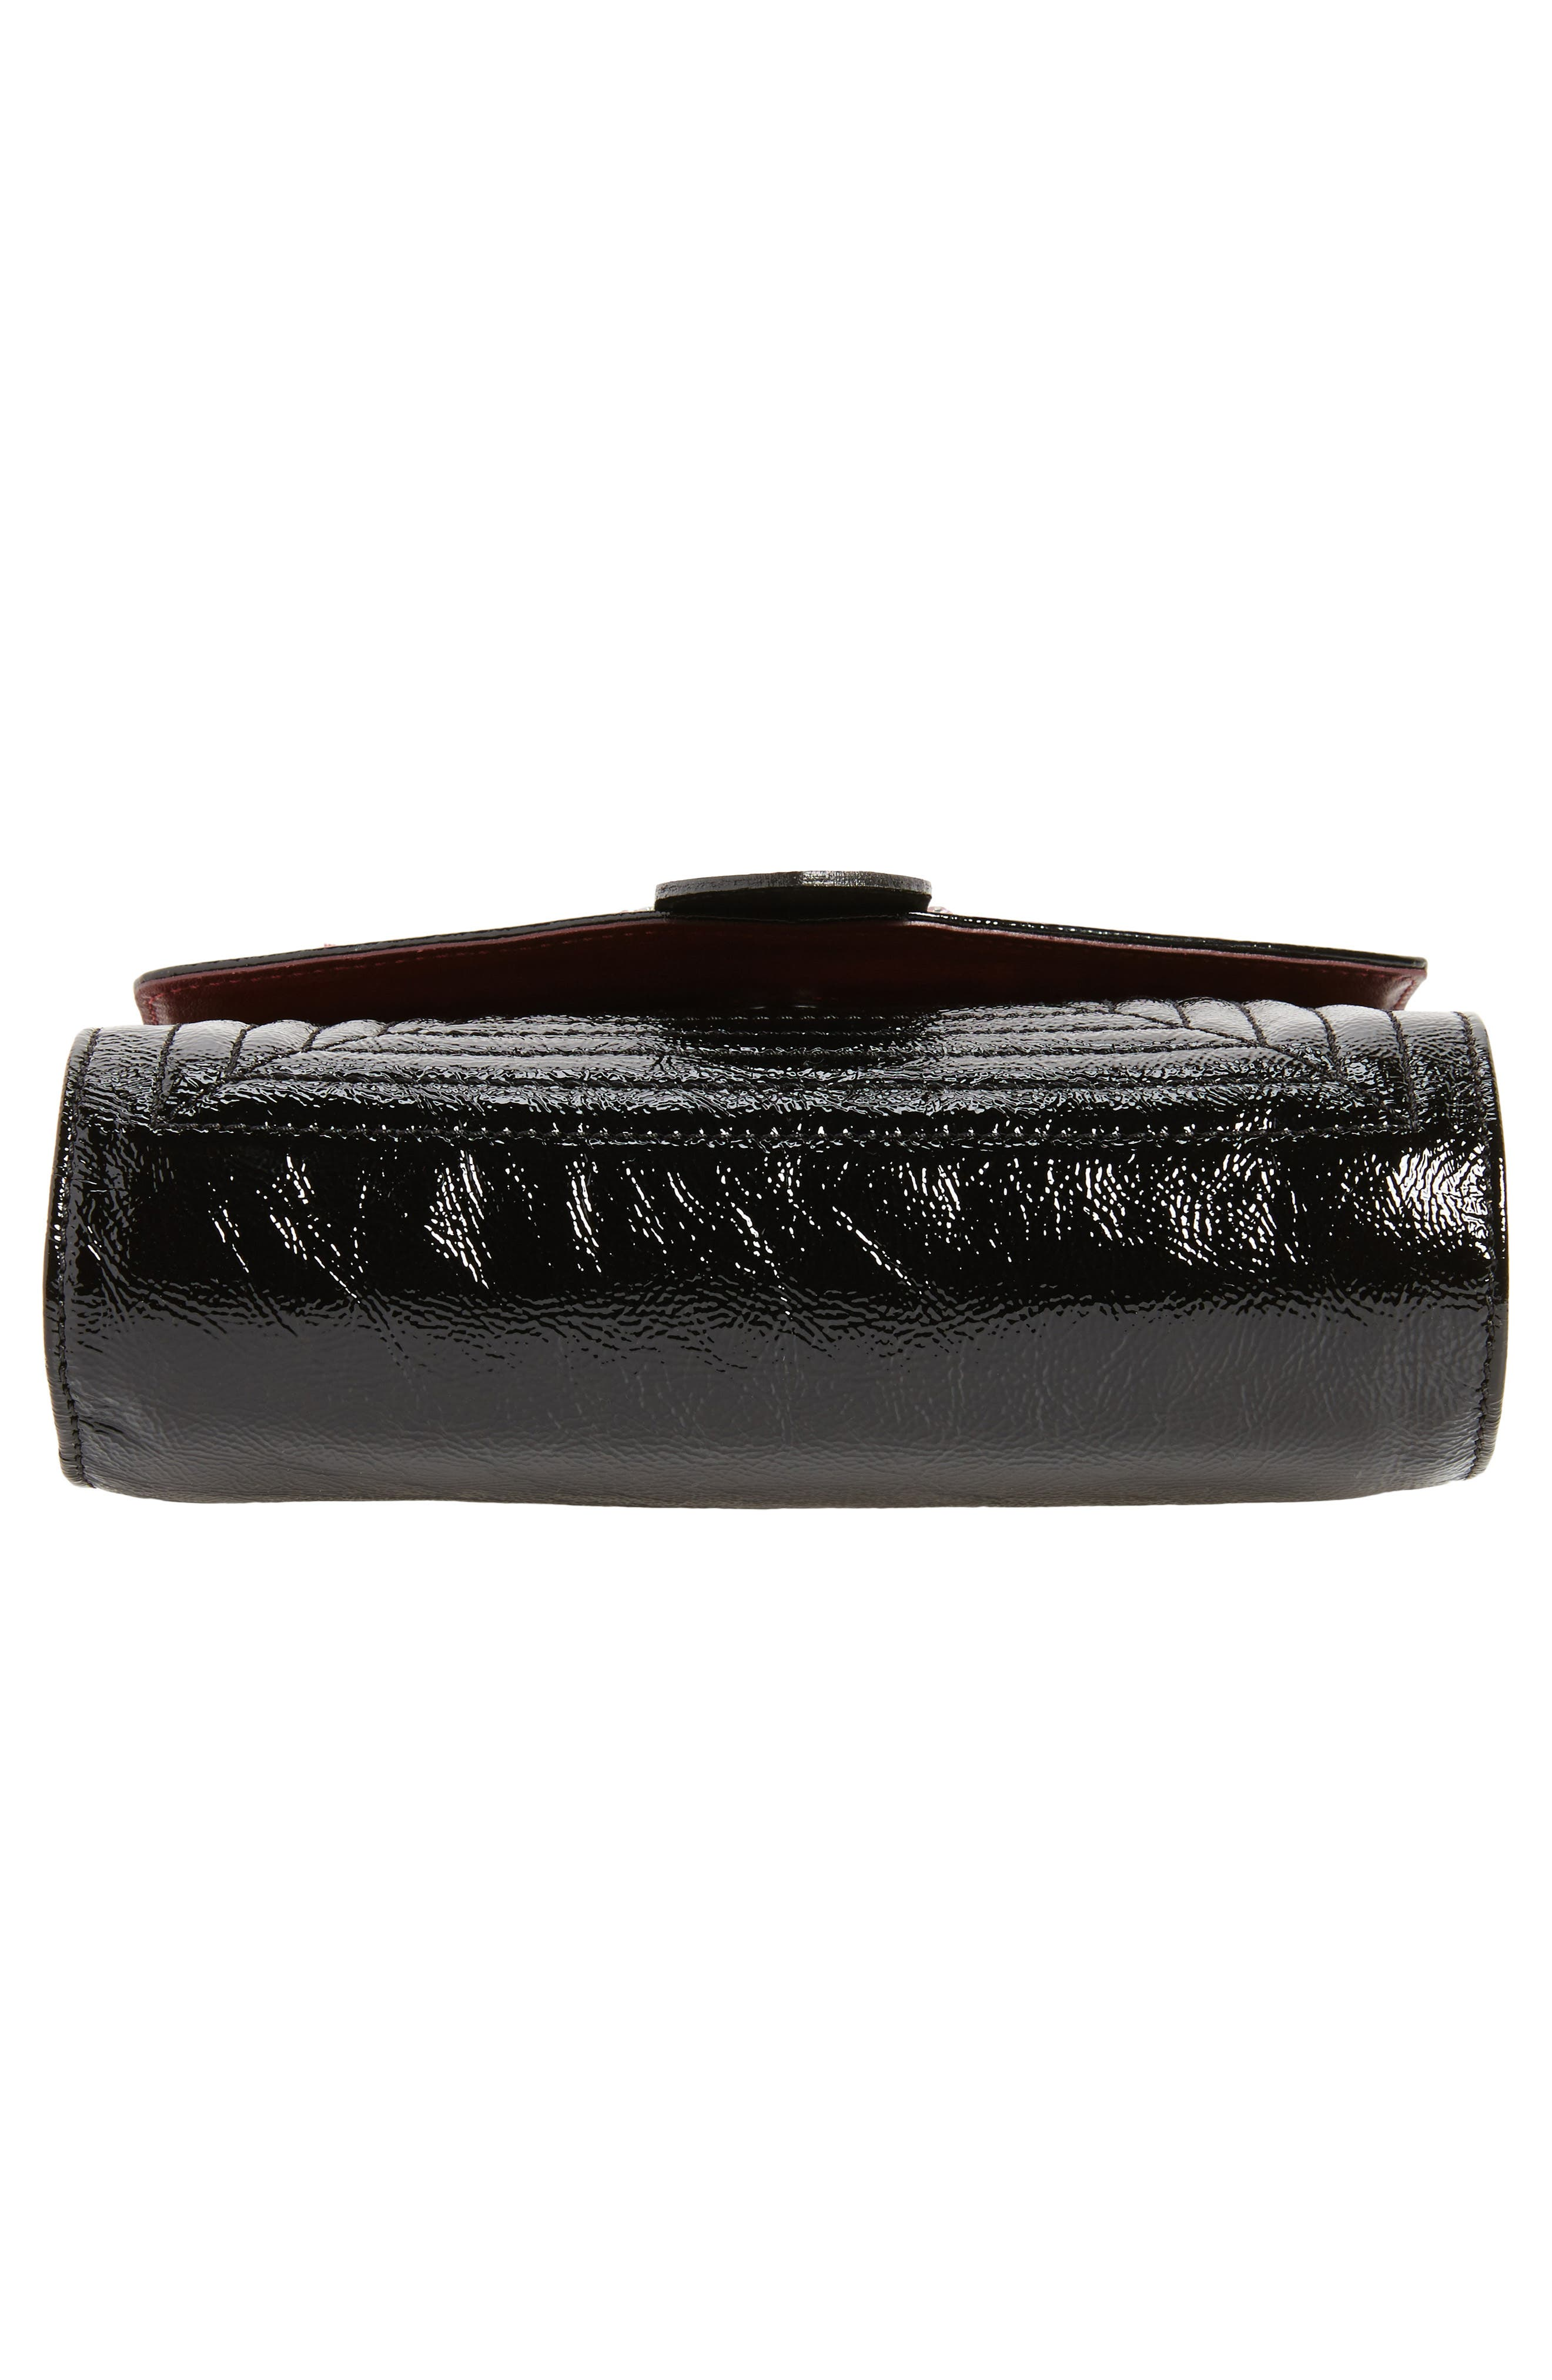 La Baronne Genuine Shearling Trim Leather Clutch,                             Alternate thumbnail 6, color,